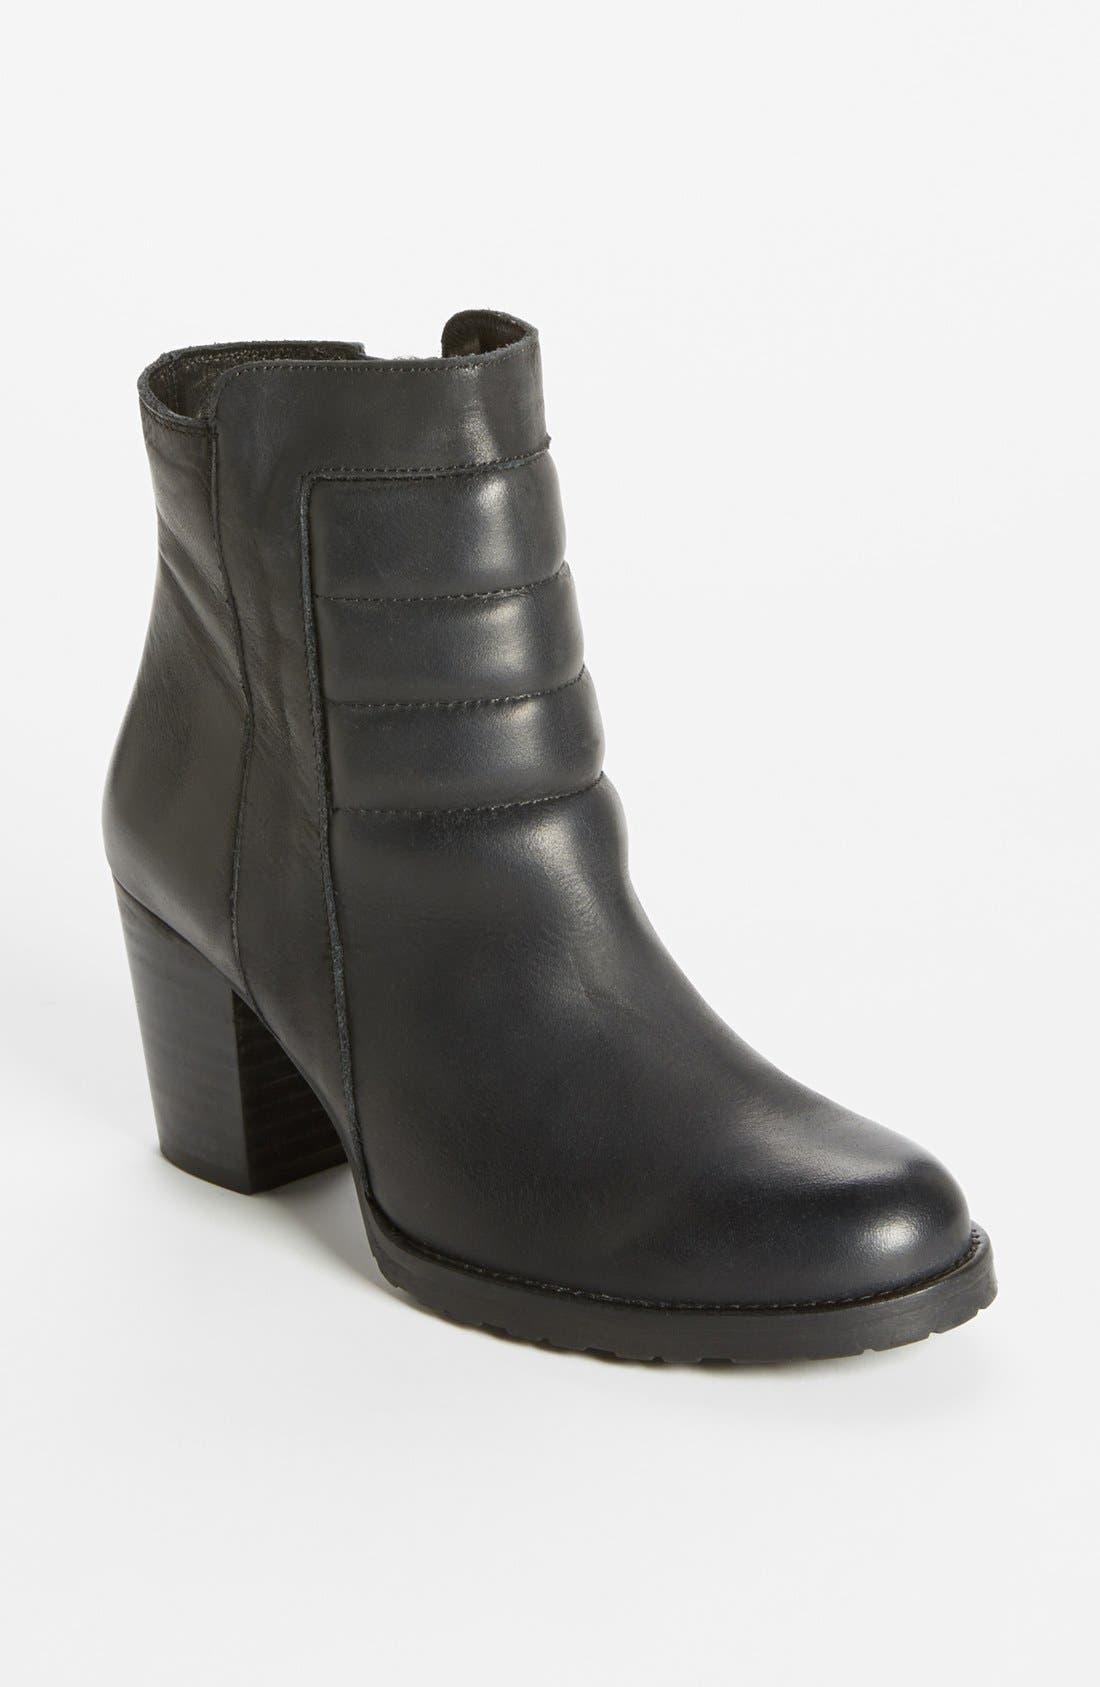 Alternate Image 1 Selected - Kurt Geiger London 'Arno' Boot (Online Only)